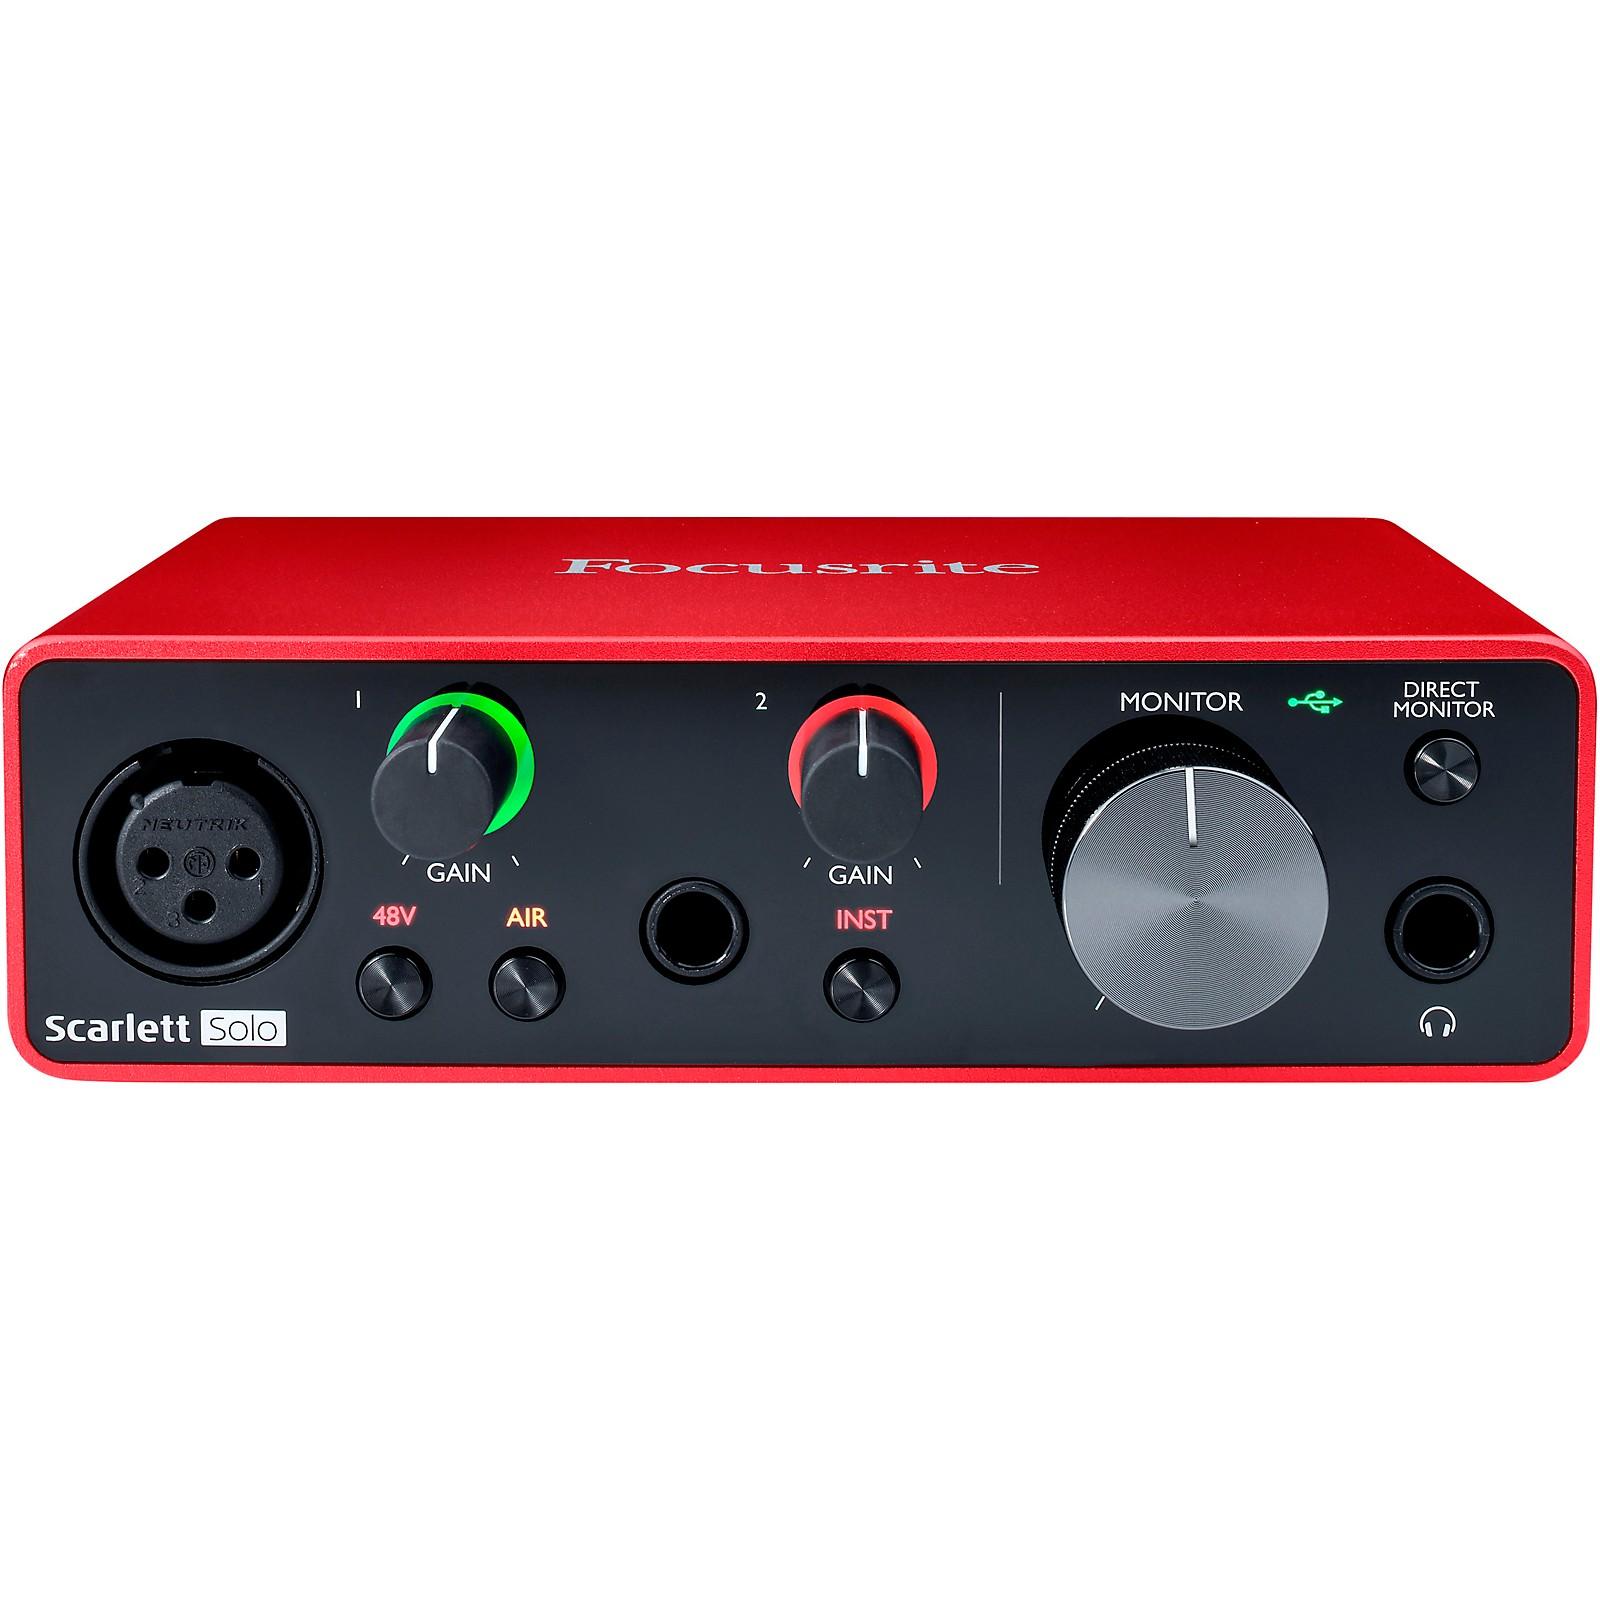 Focusrite Scarlett Solo USB Audio Interface (Gen 3)